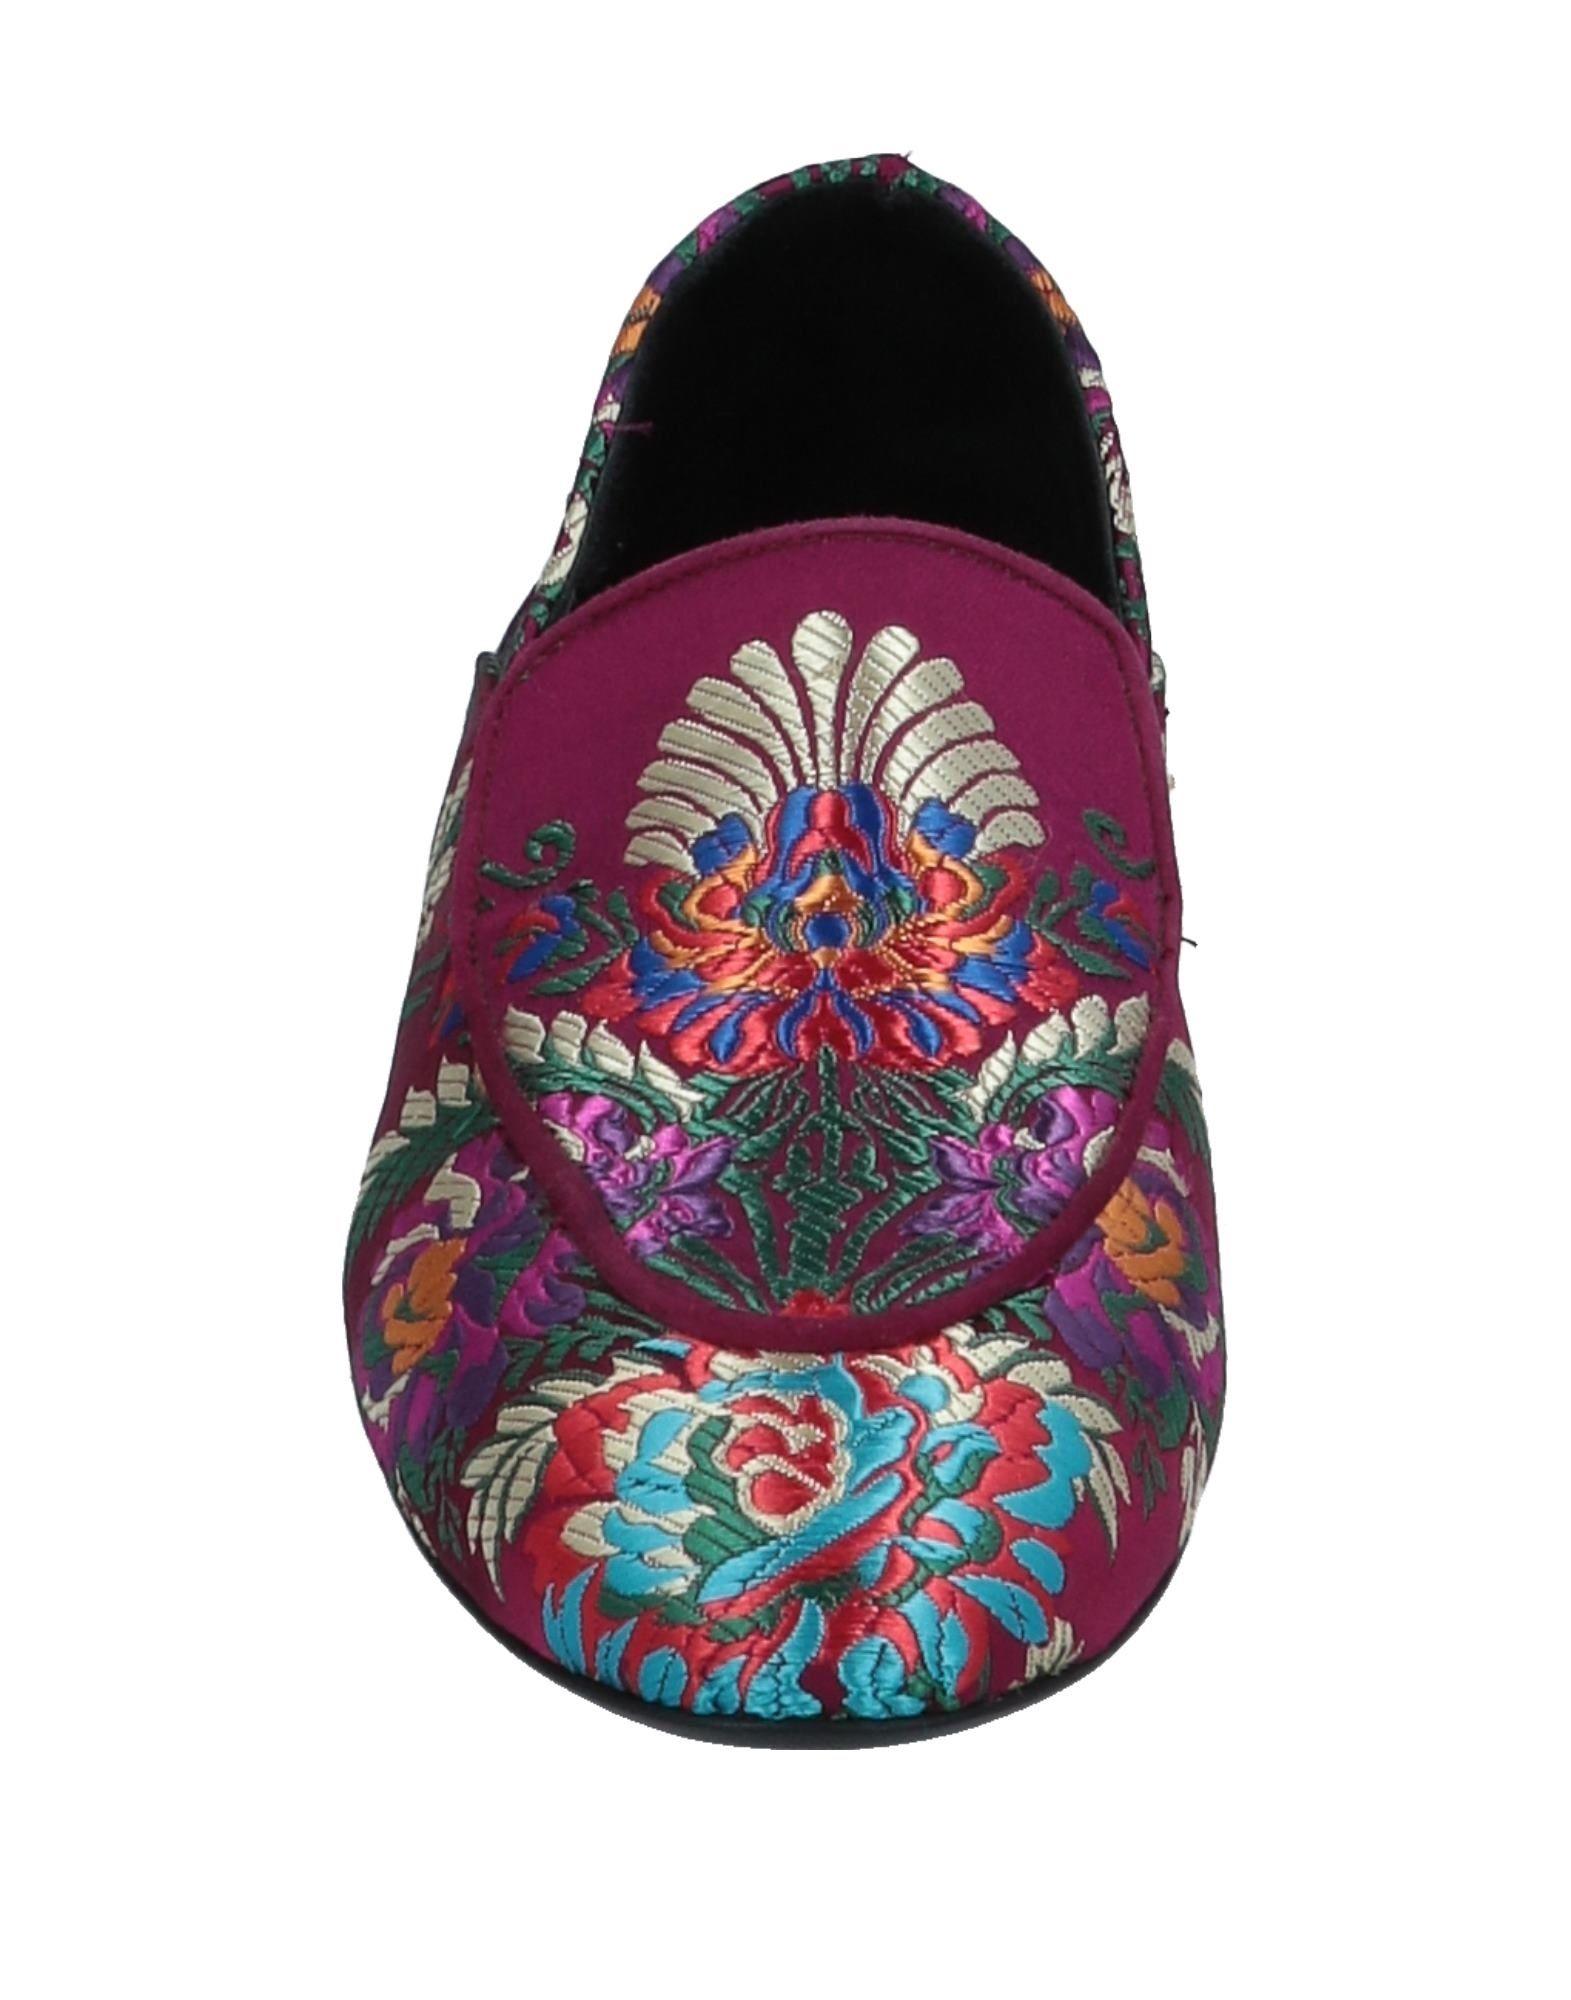 9f153767d117 ... Emanuela Caruso Capri Loafers - Women Women Women Emanuela Caruso Capri  Loafers online on United Kingdom